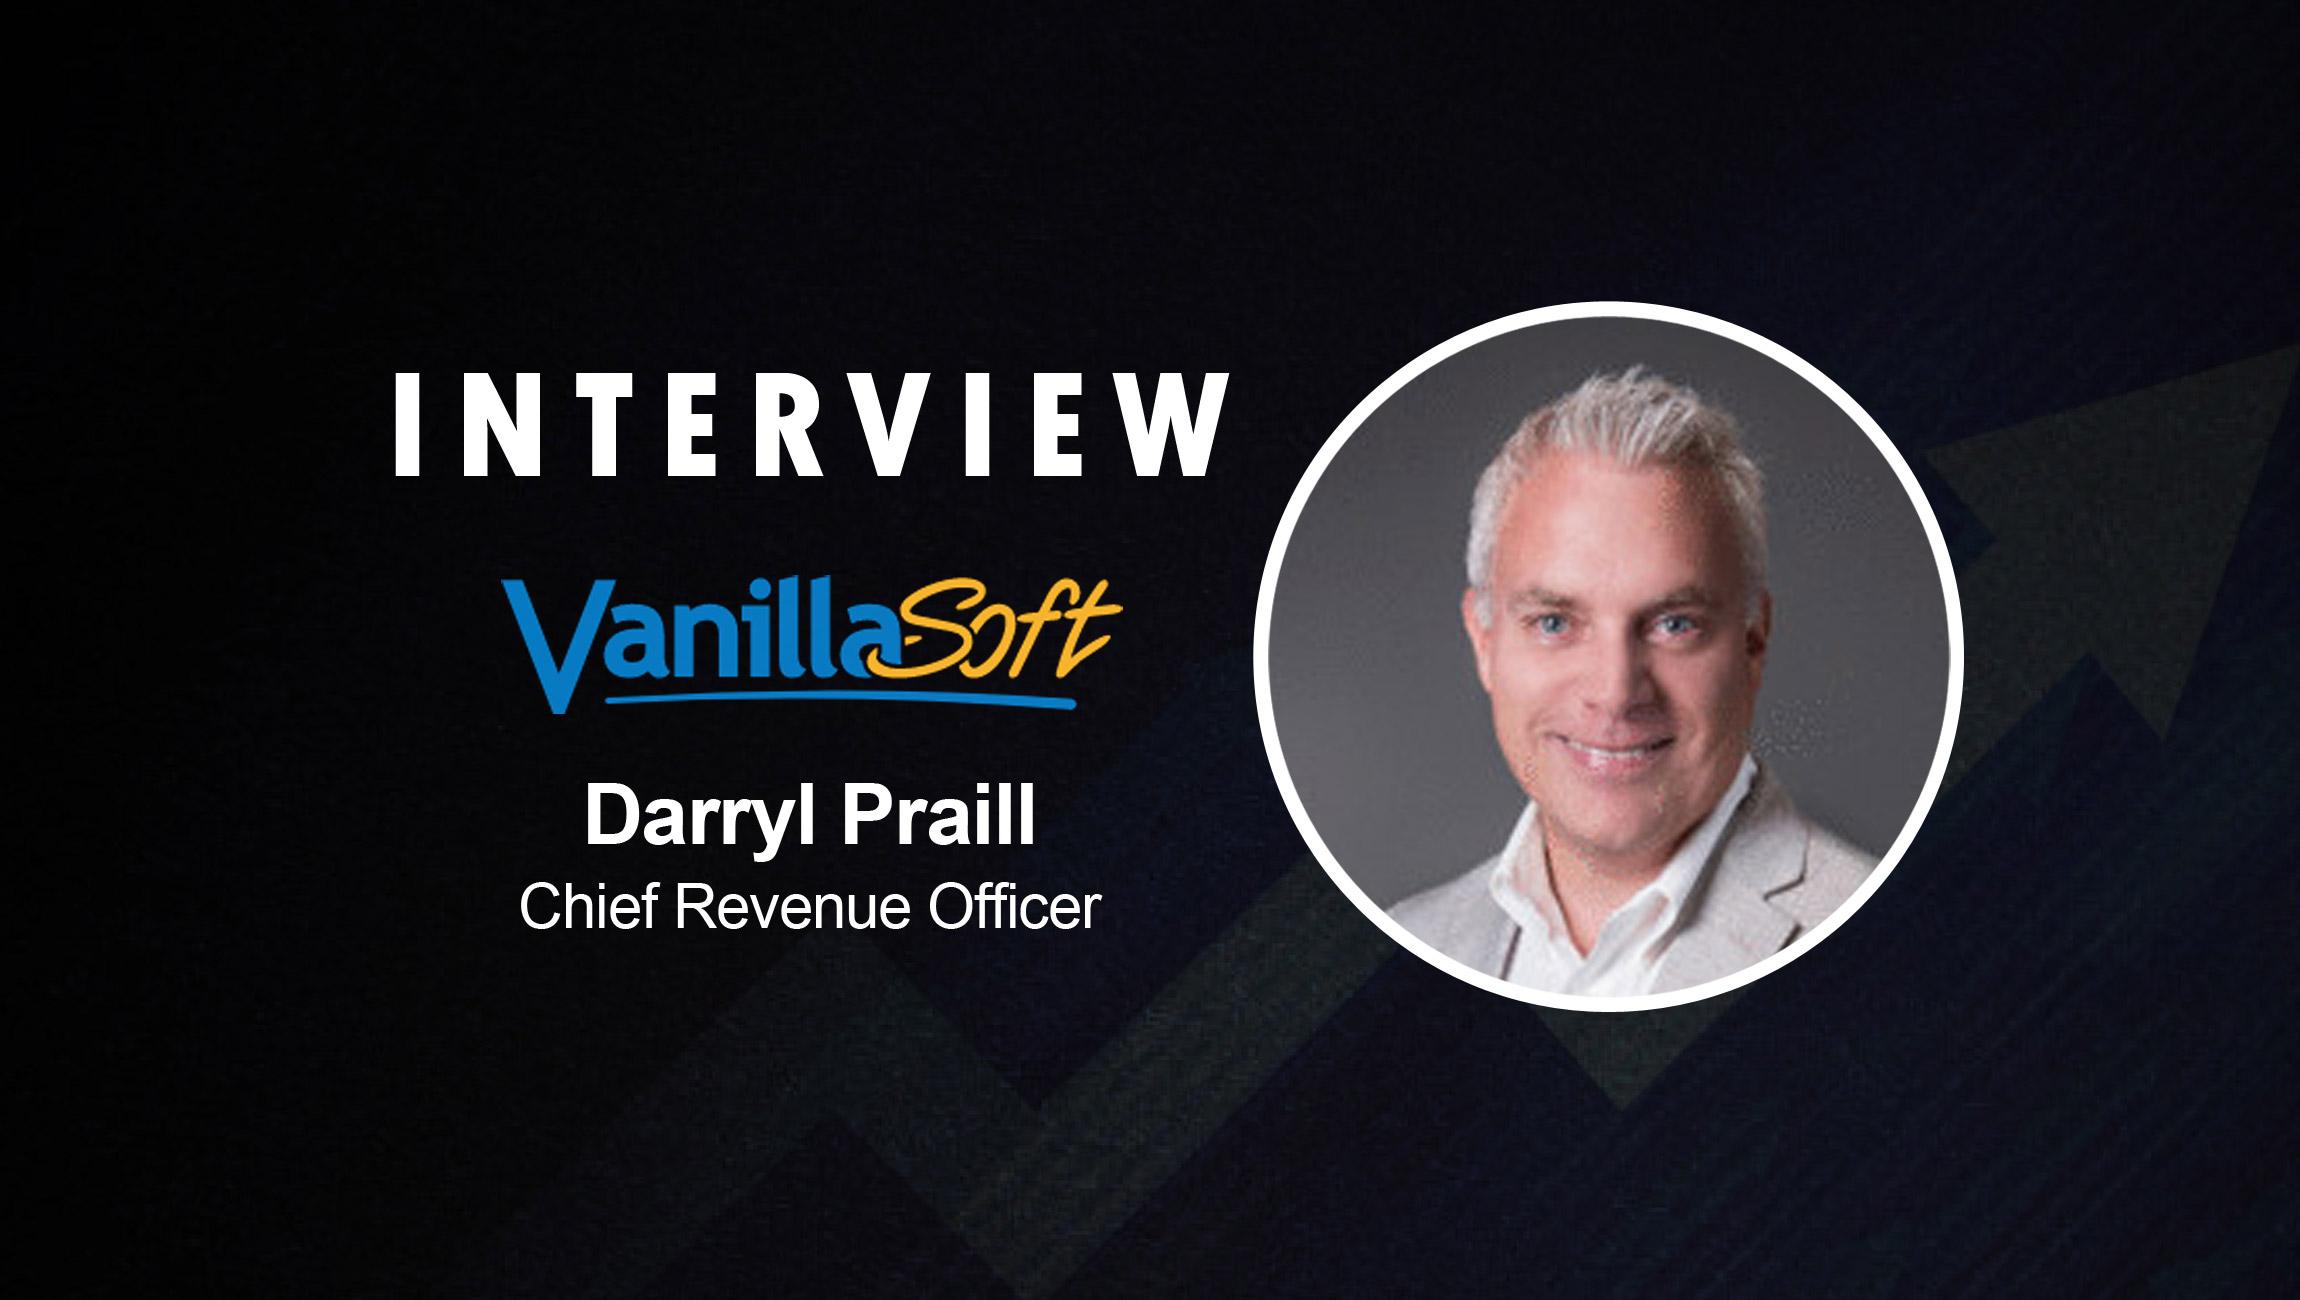 SalesTechStar Interview with Darryl Praill, Chief Revenue Officer at VanillaSoft